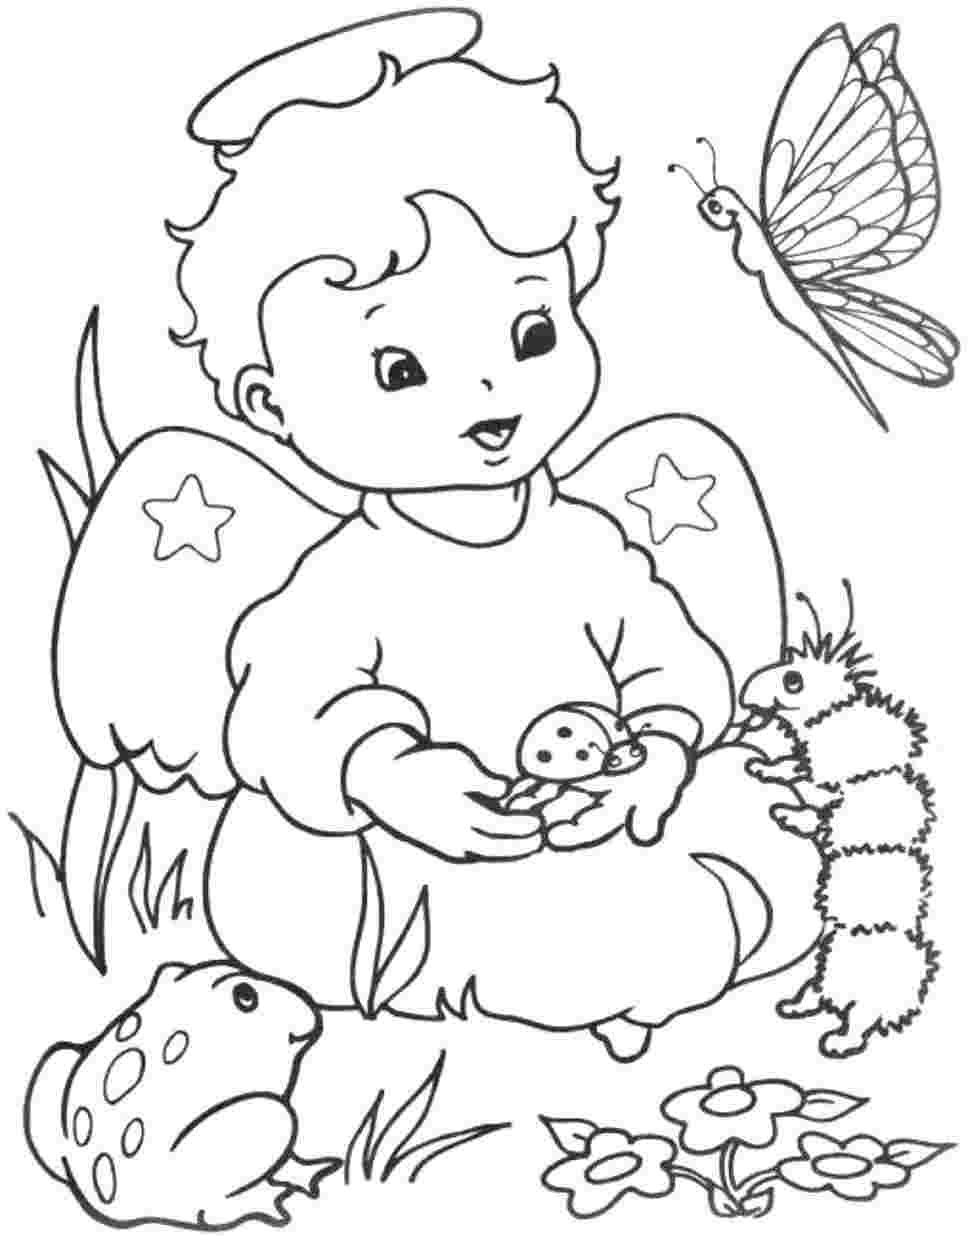 Imagens Infantis Para Imprimir